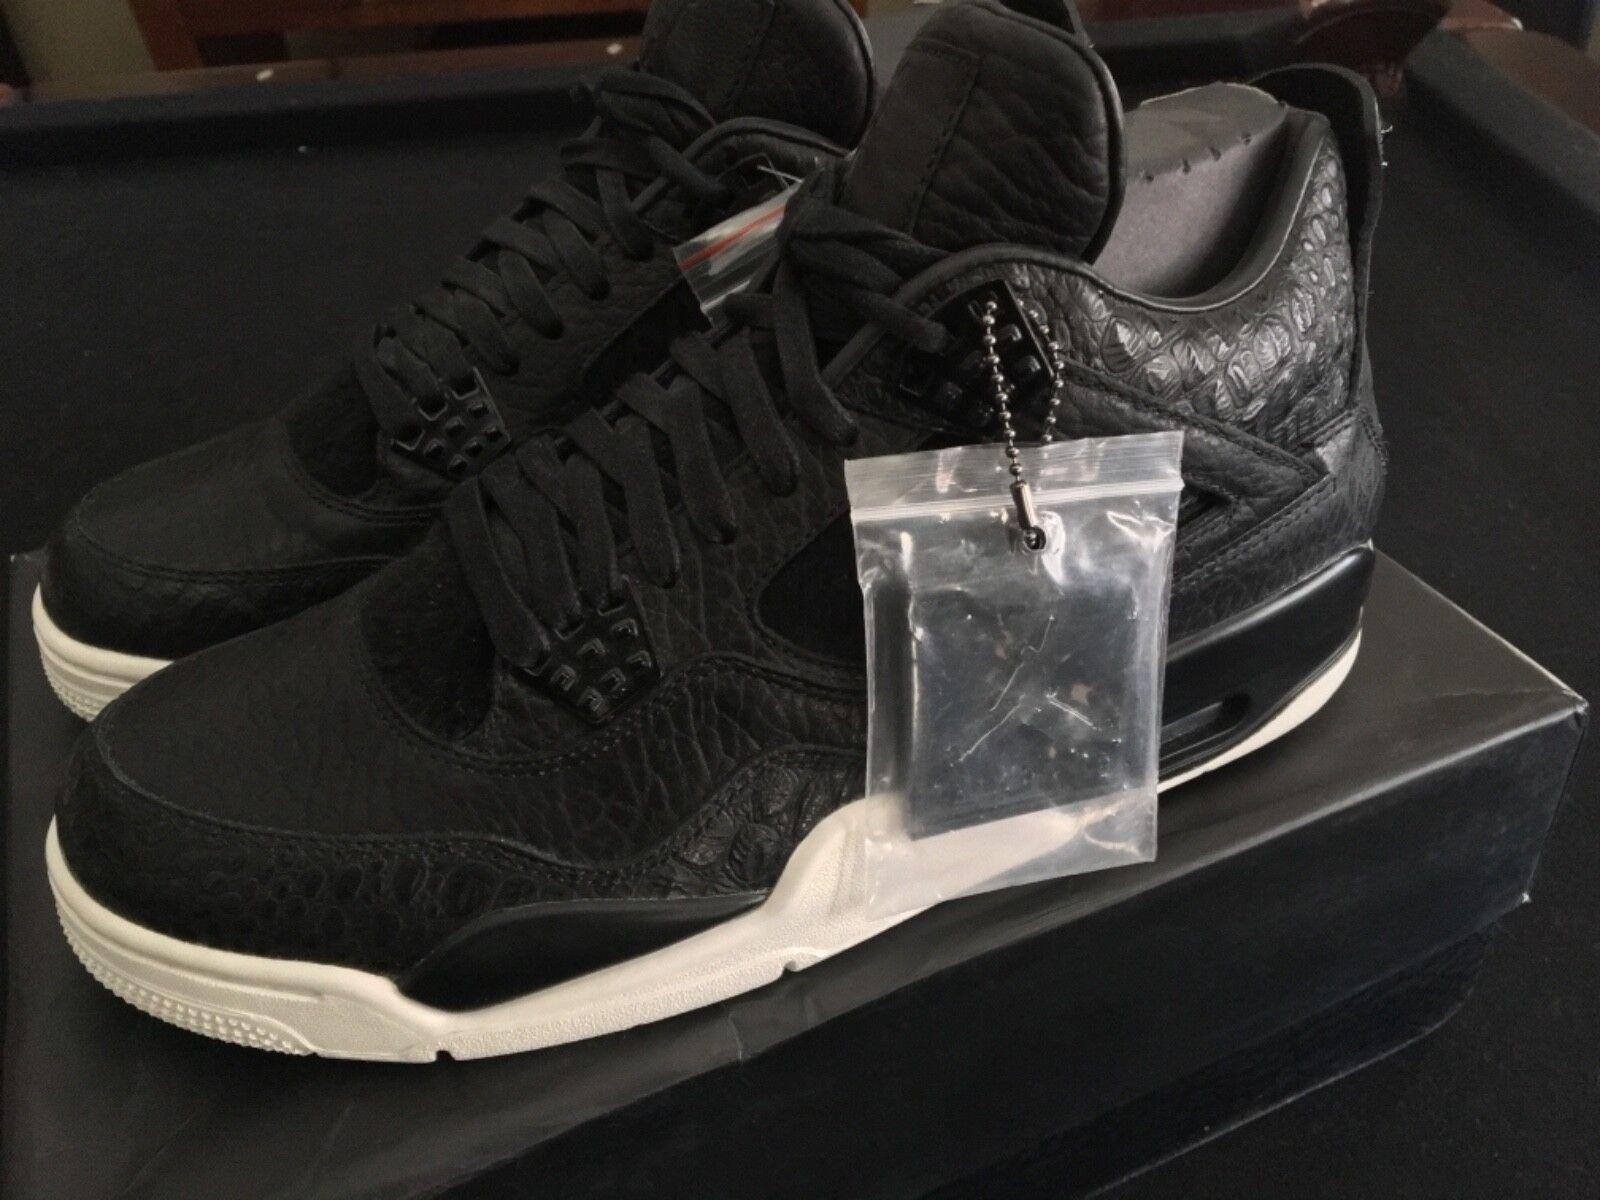 Nike Air Jordan 4 IV Retro Premium Black Pony Pinnacle 819139-010 Size 10.5